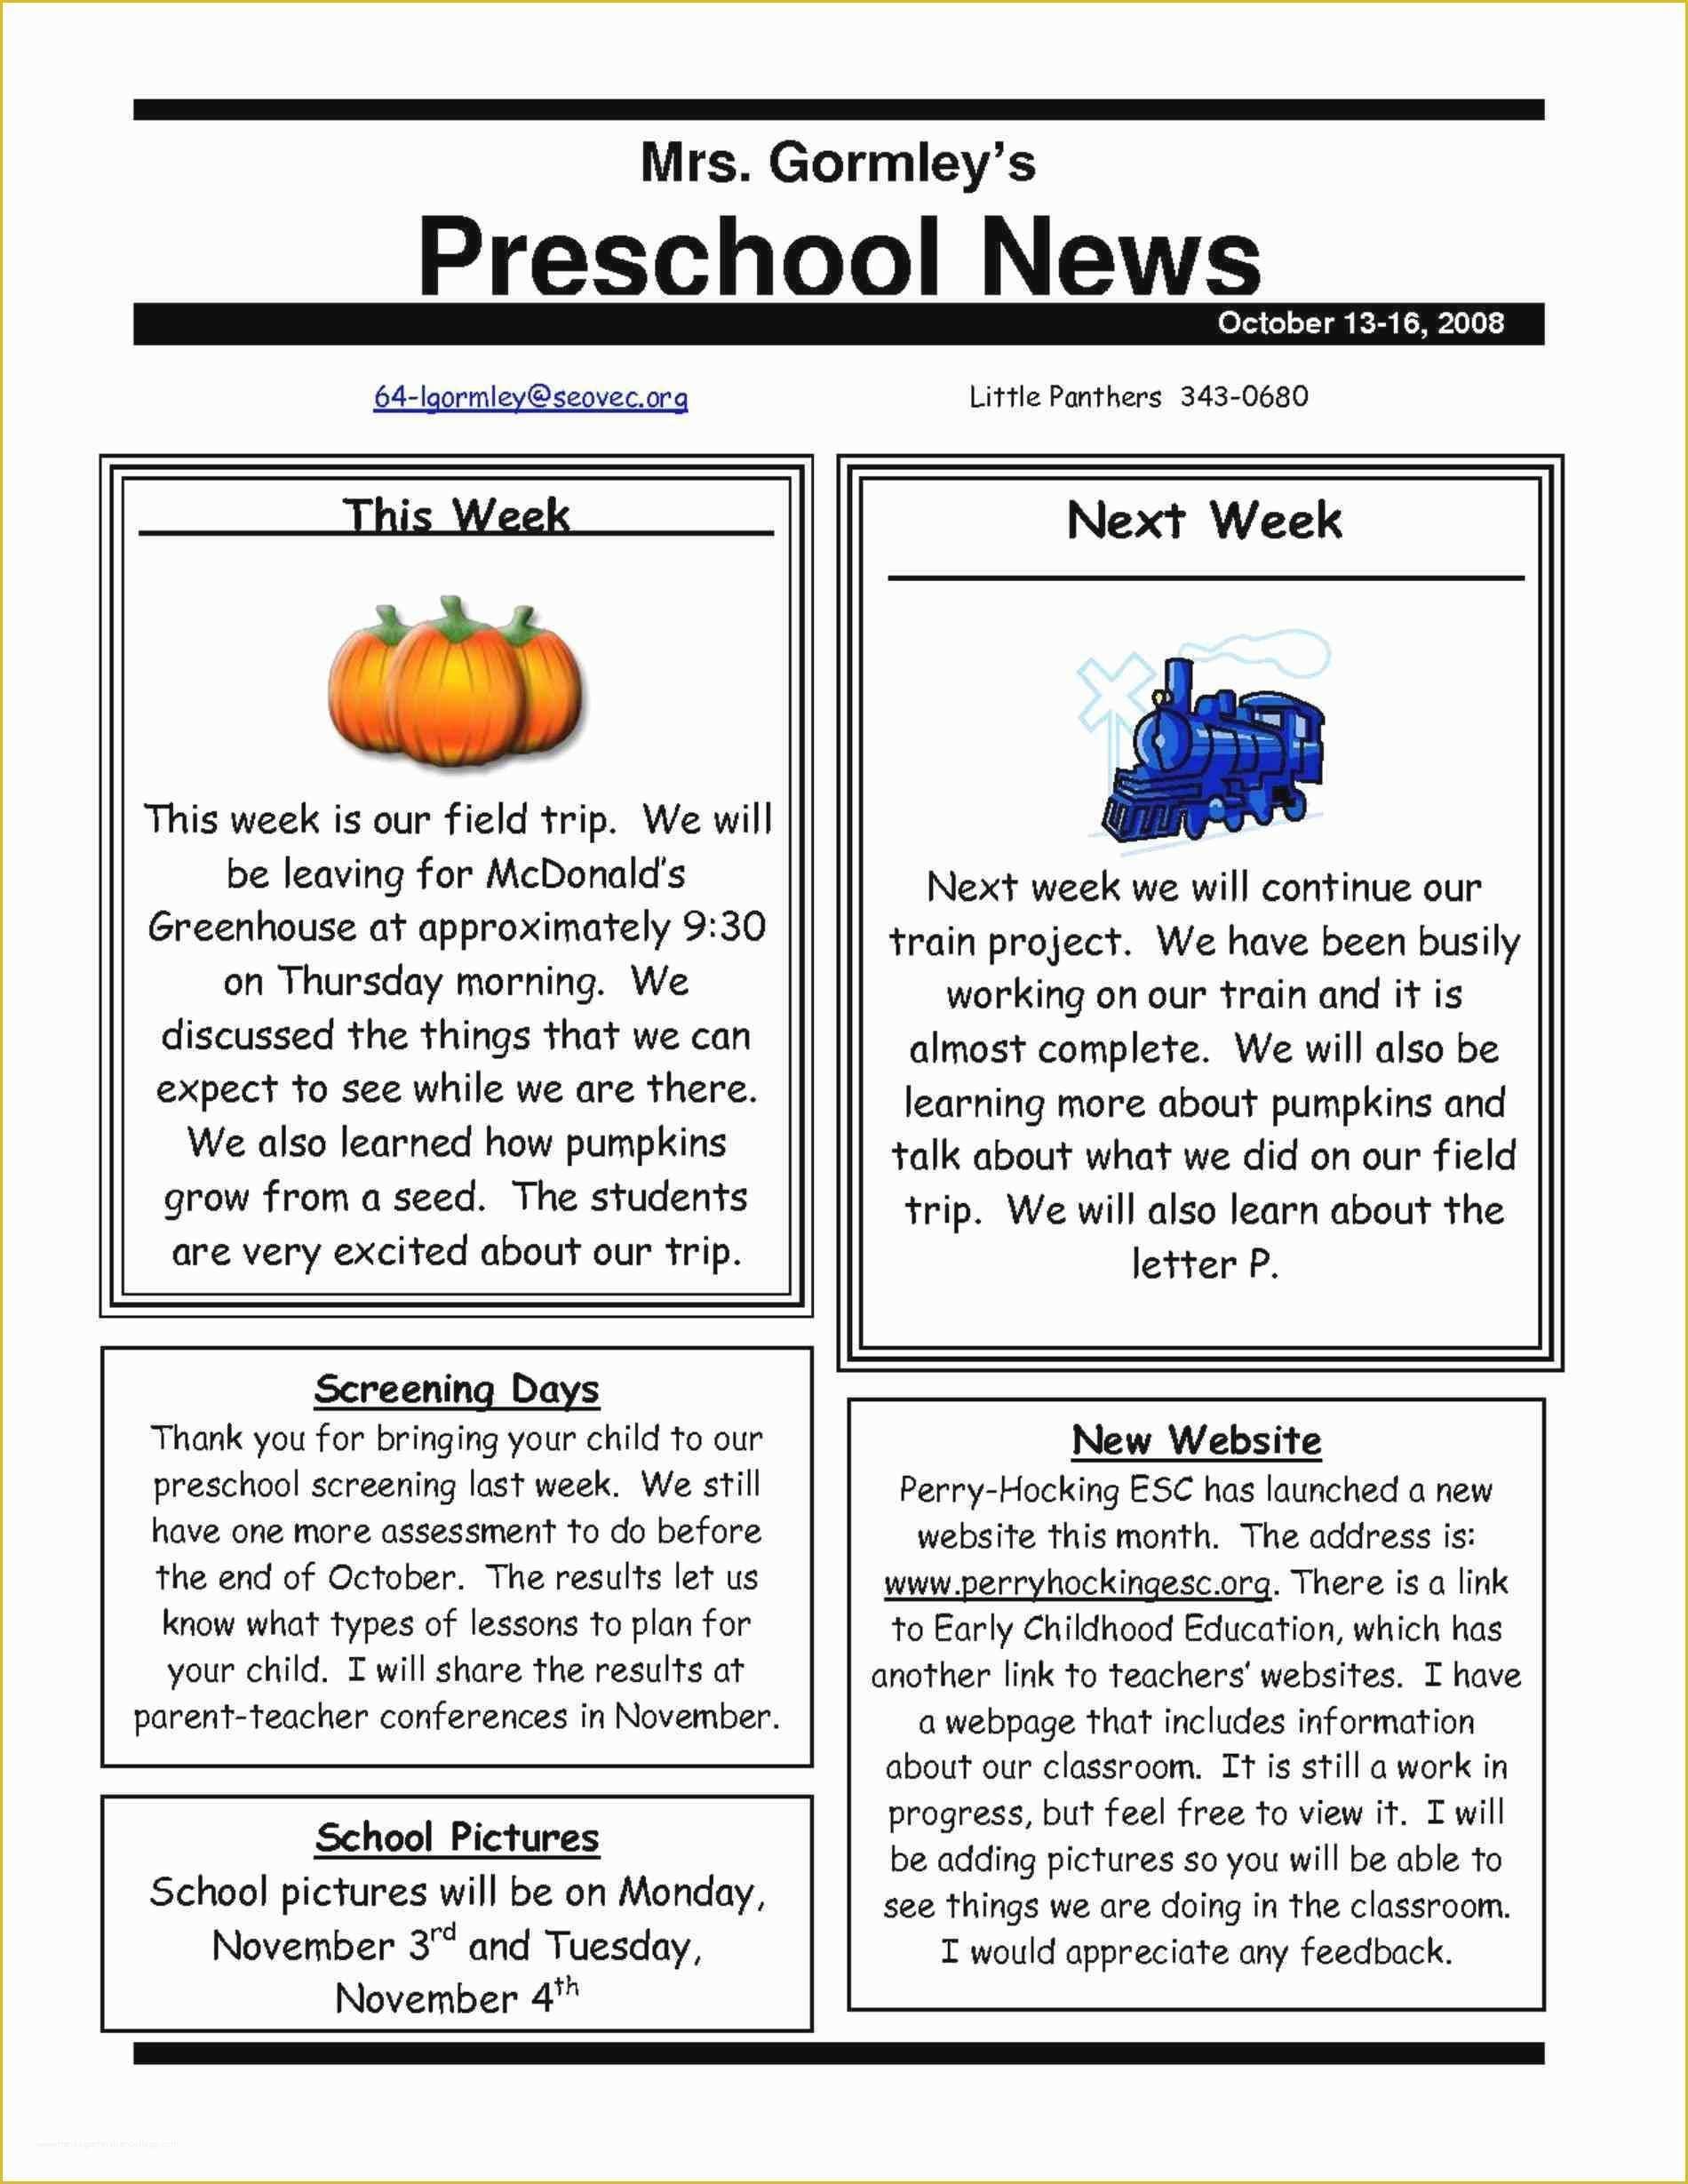 Free Teacher Newsletter Templates Microsoft Word Of Elegant Free Editable Newsletter Templates For Preschool